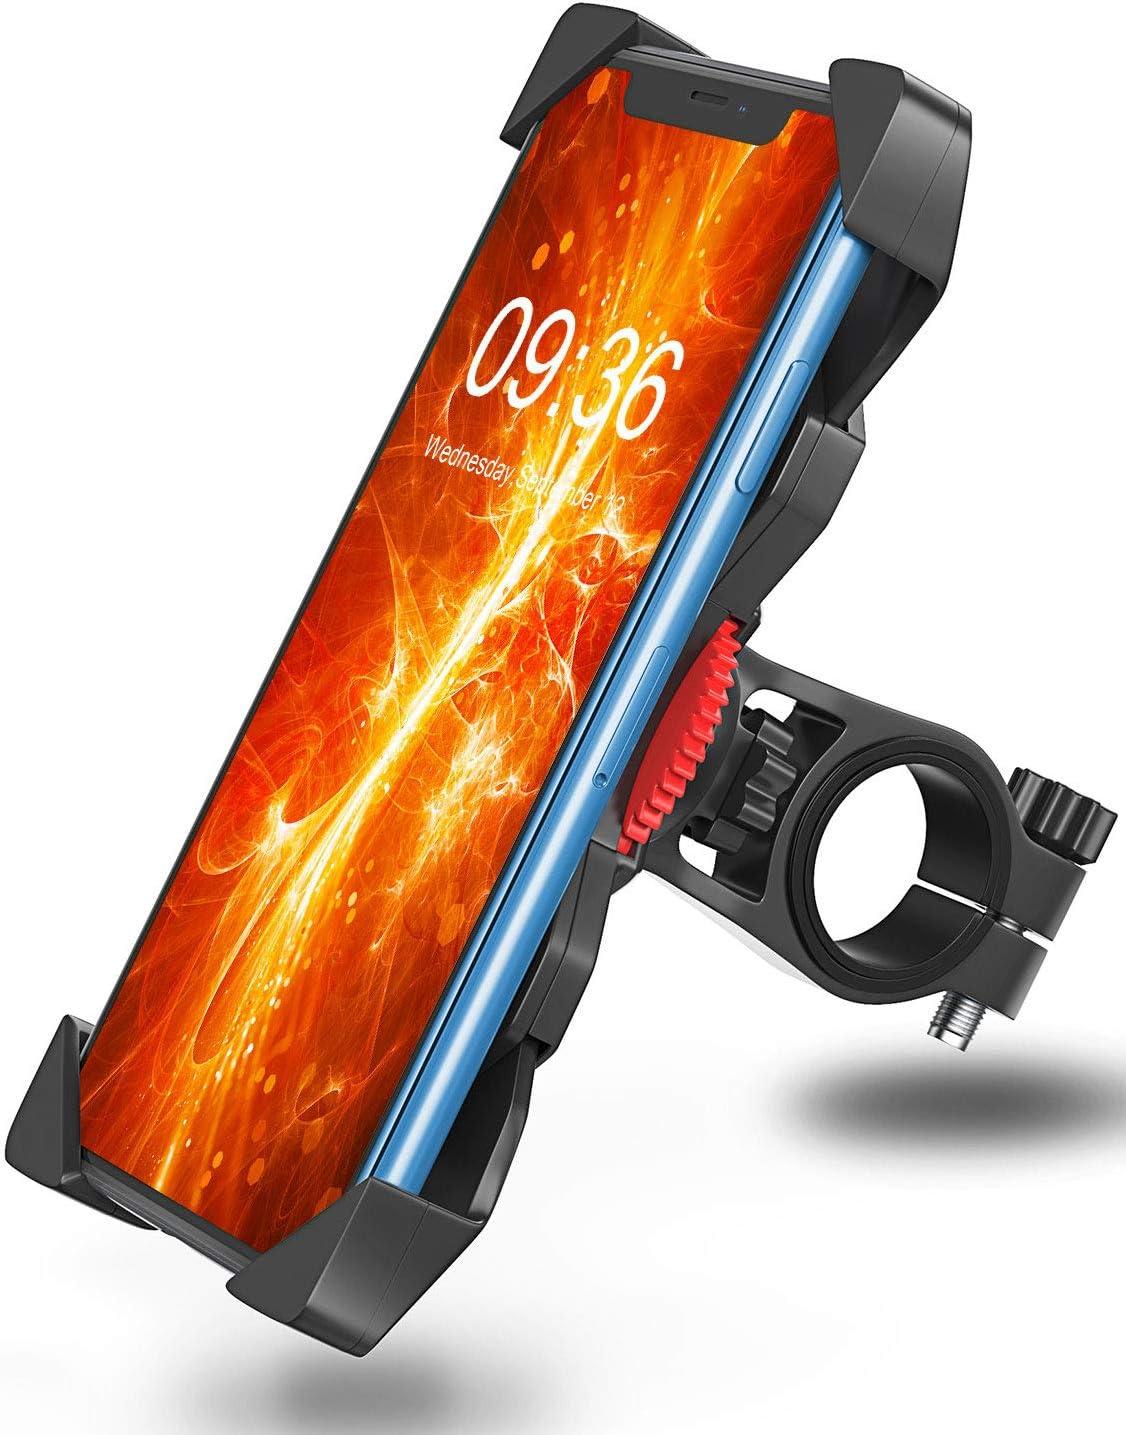 Bovon Soporte Movil Bicicleta, Anti Vibración Soporte Movil Bici Montaña con 360° Rotación para Moto Bici, Universal Manillar Compatible con iPhone 11 Pro Max/11 Pro/11/X/8, Samsung y 3.5